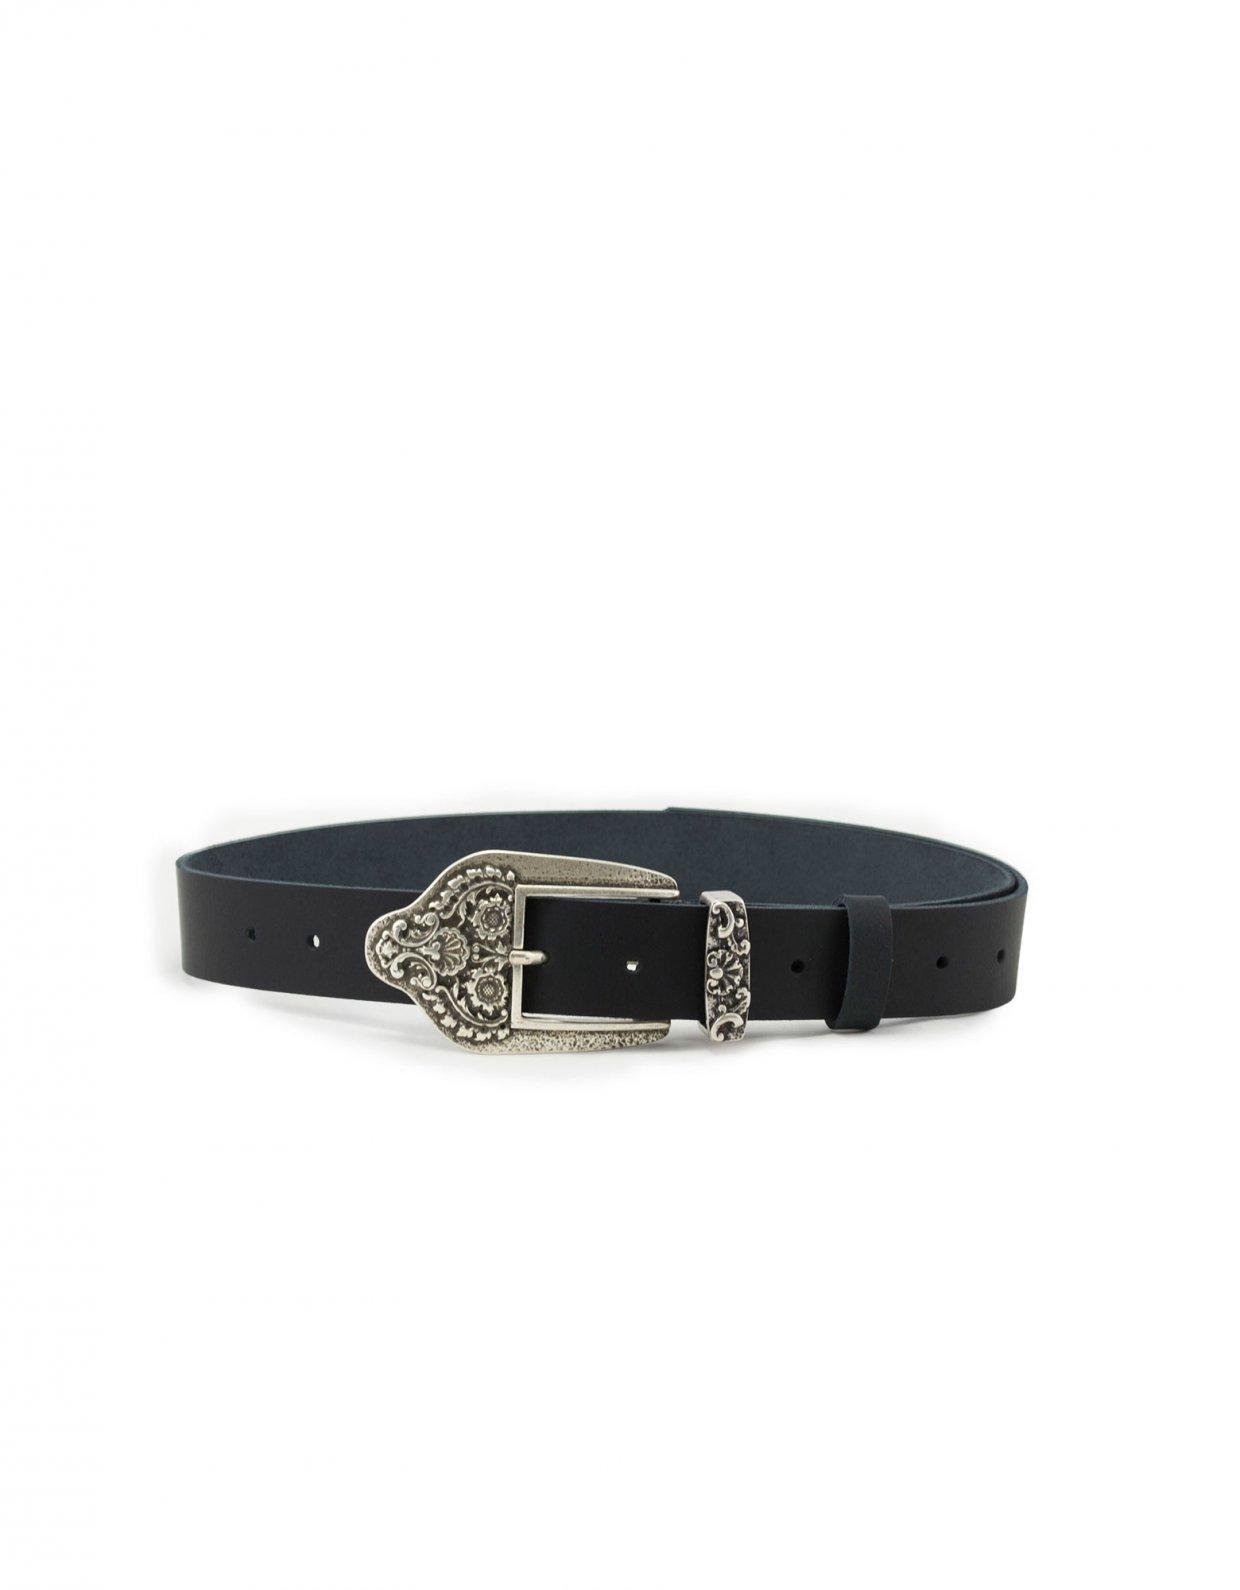 Individual Art Leather Flawless belt black